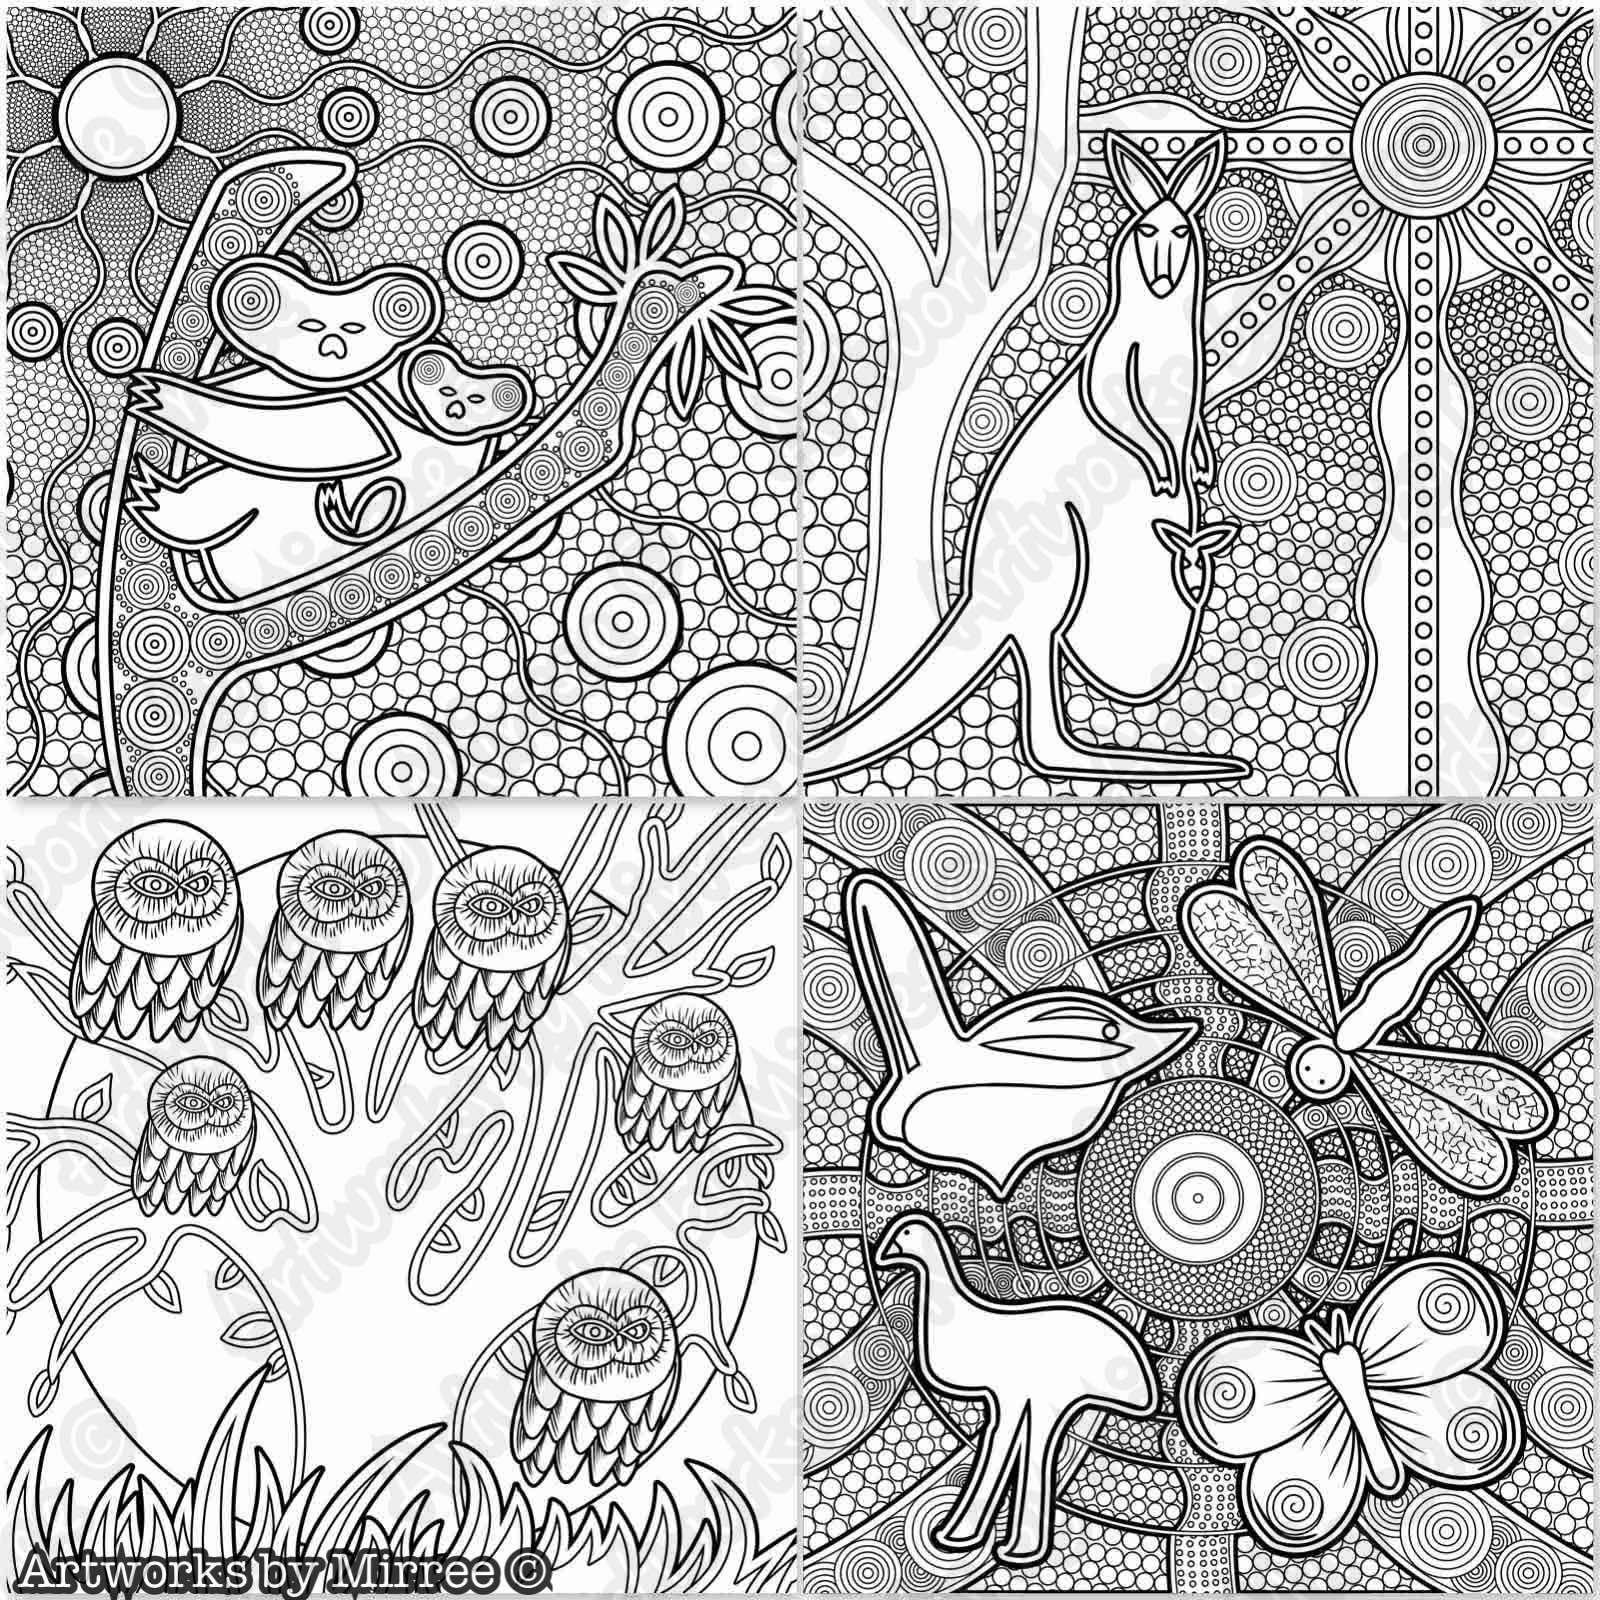 Universal Dreaming Colouring Book Colouring Book By Mirree Contemporary Dreamtime Animal Series Aboriginal Dot Art Coloring Books Aboriginal Art Australian